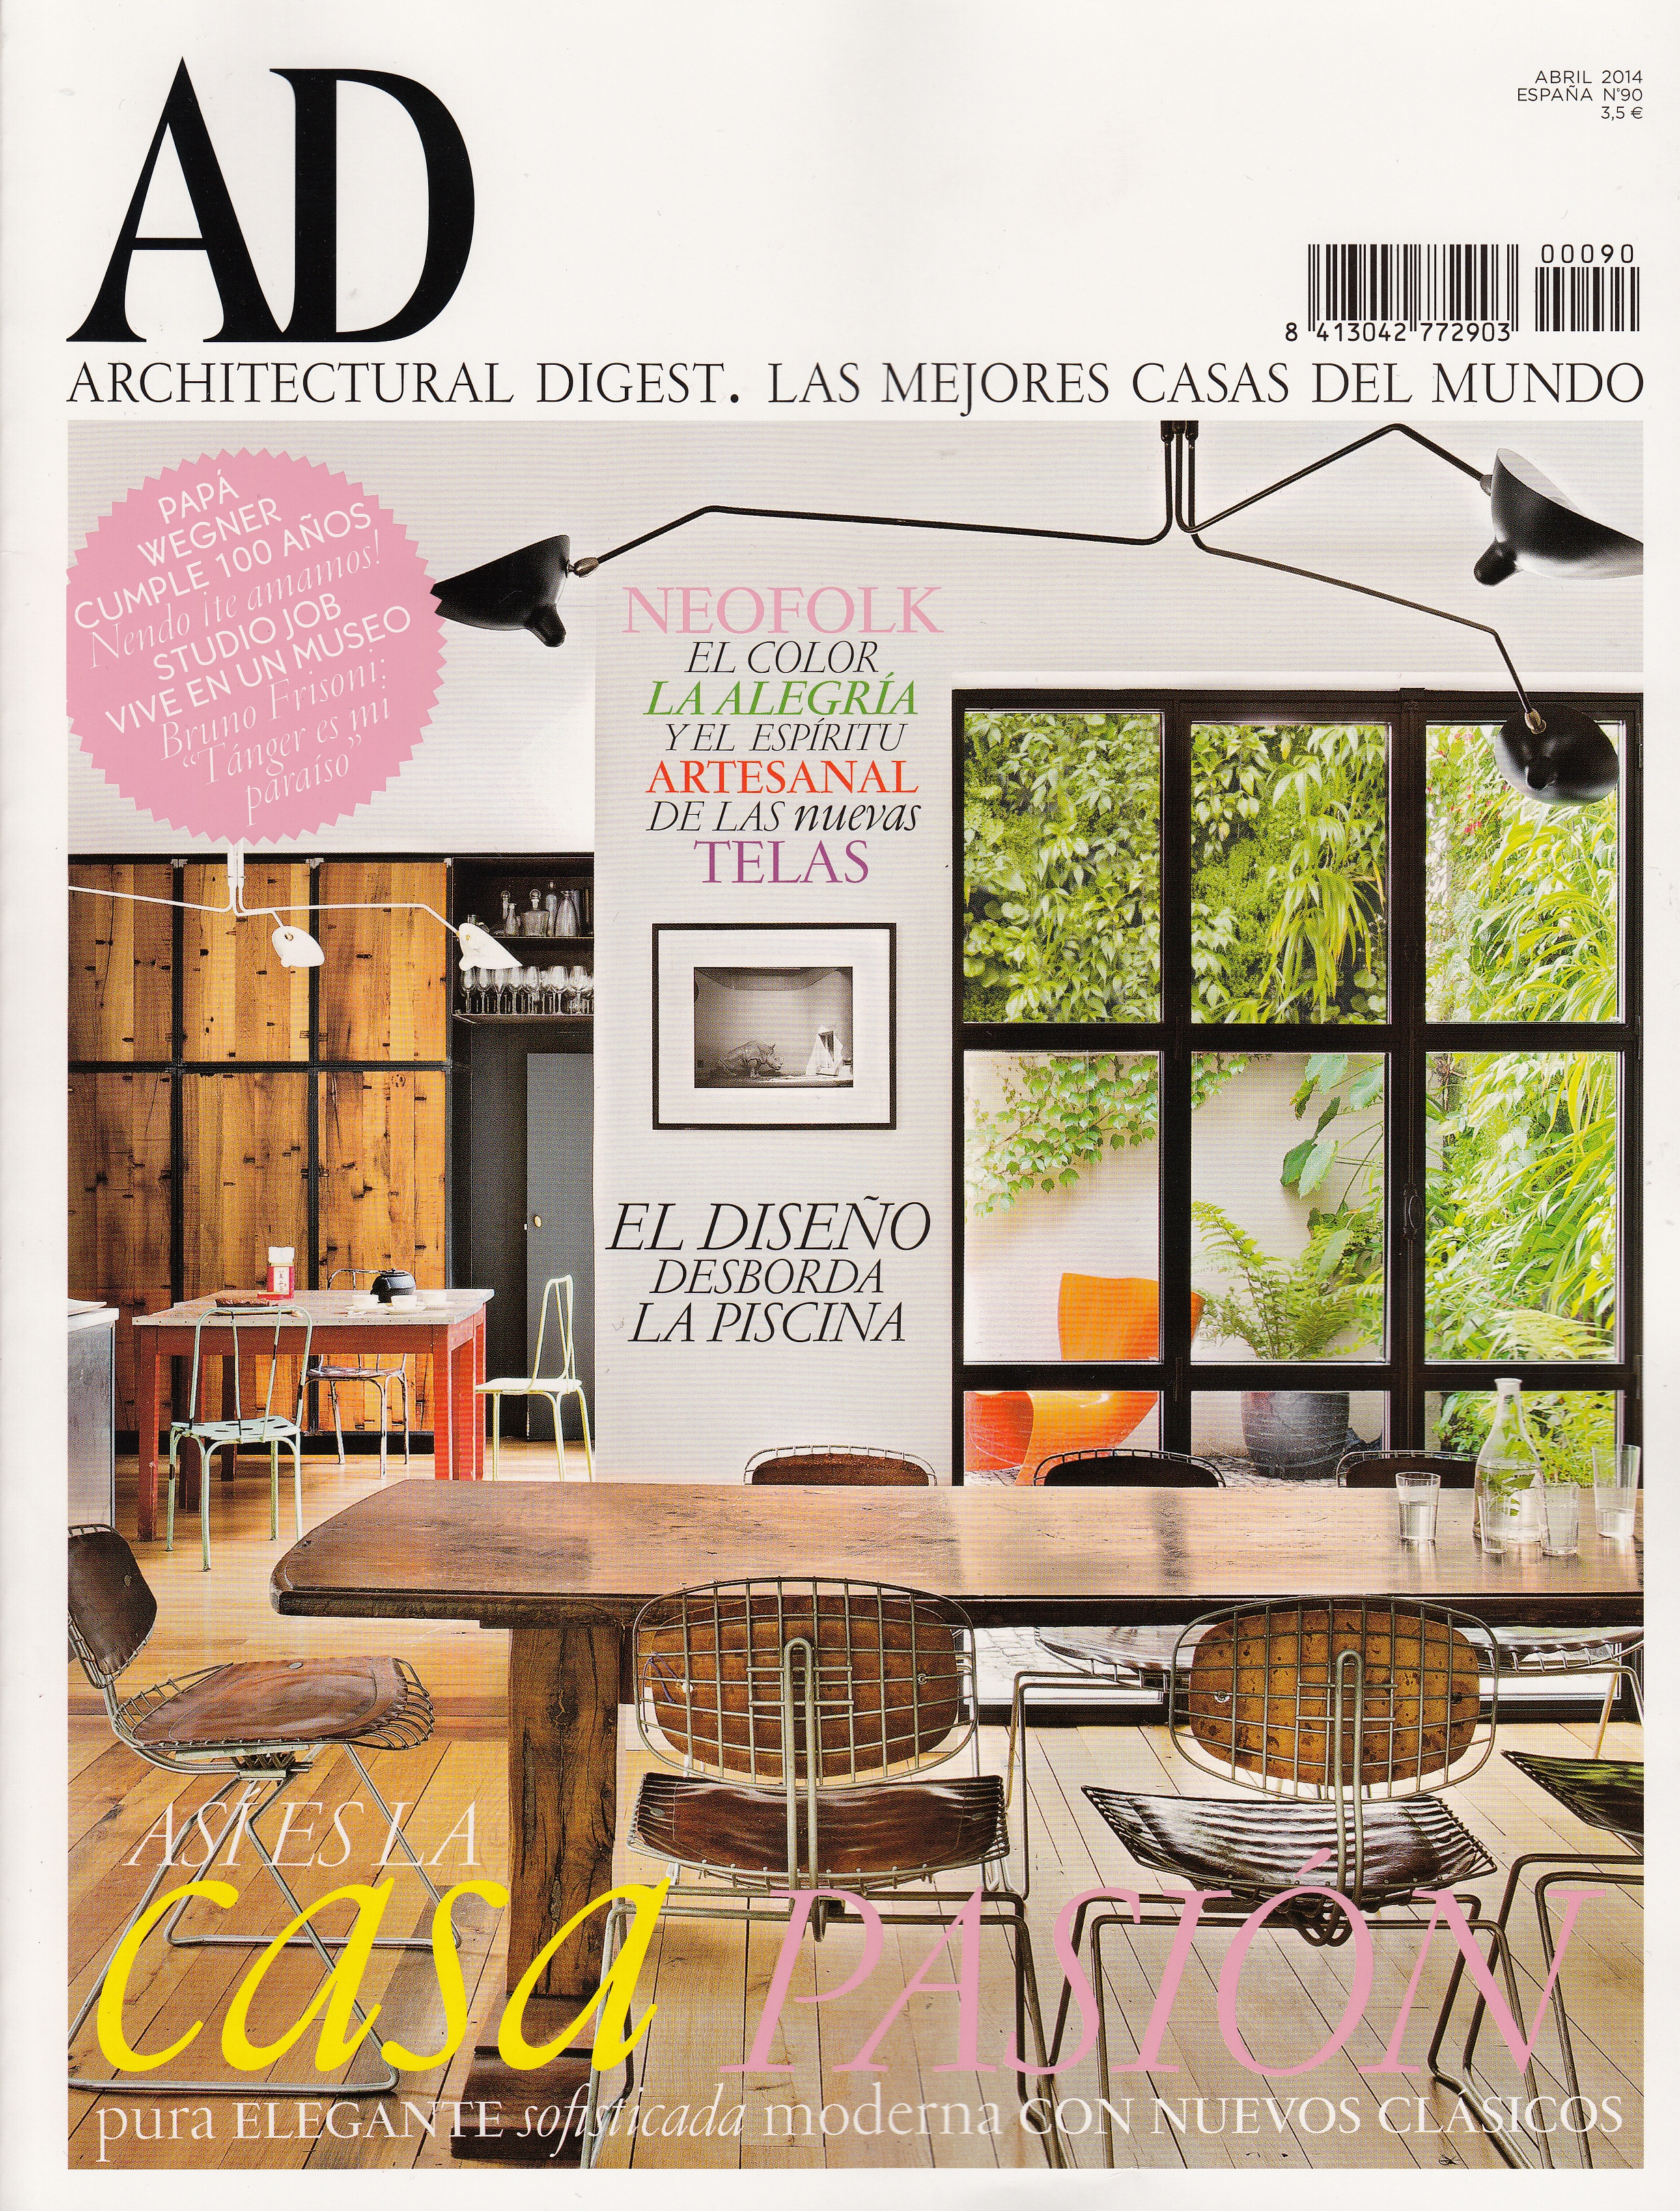 Mobiliario Interior de Diseño de Gunni & Trentino en Portada AD Abril 2014